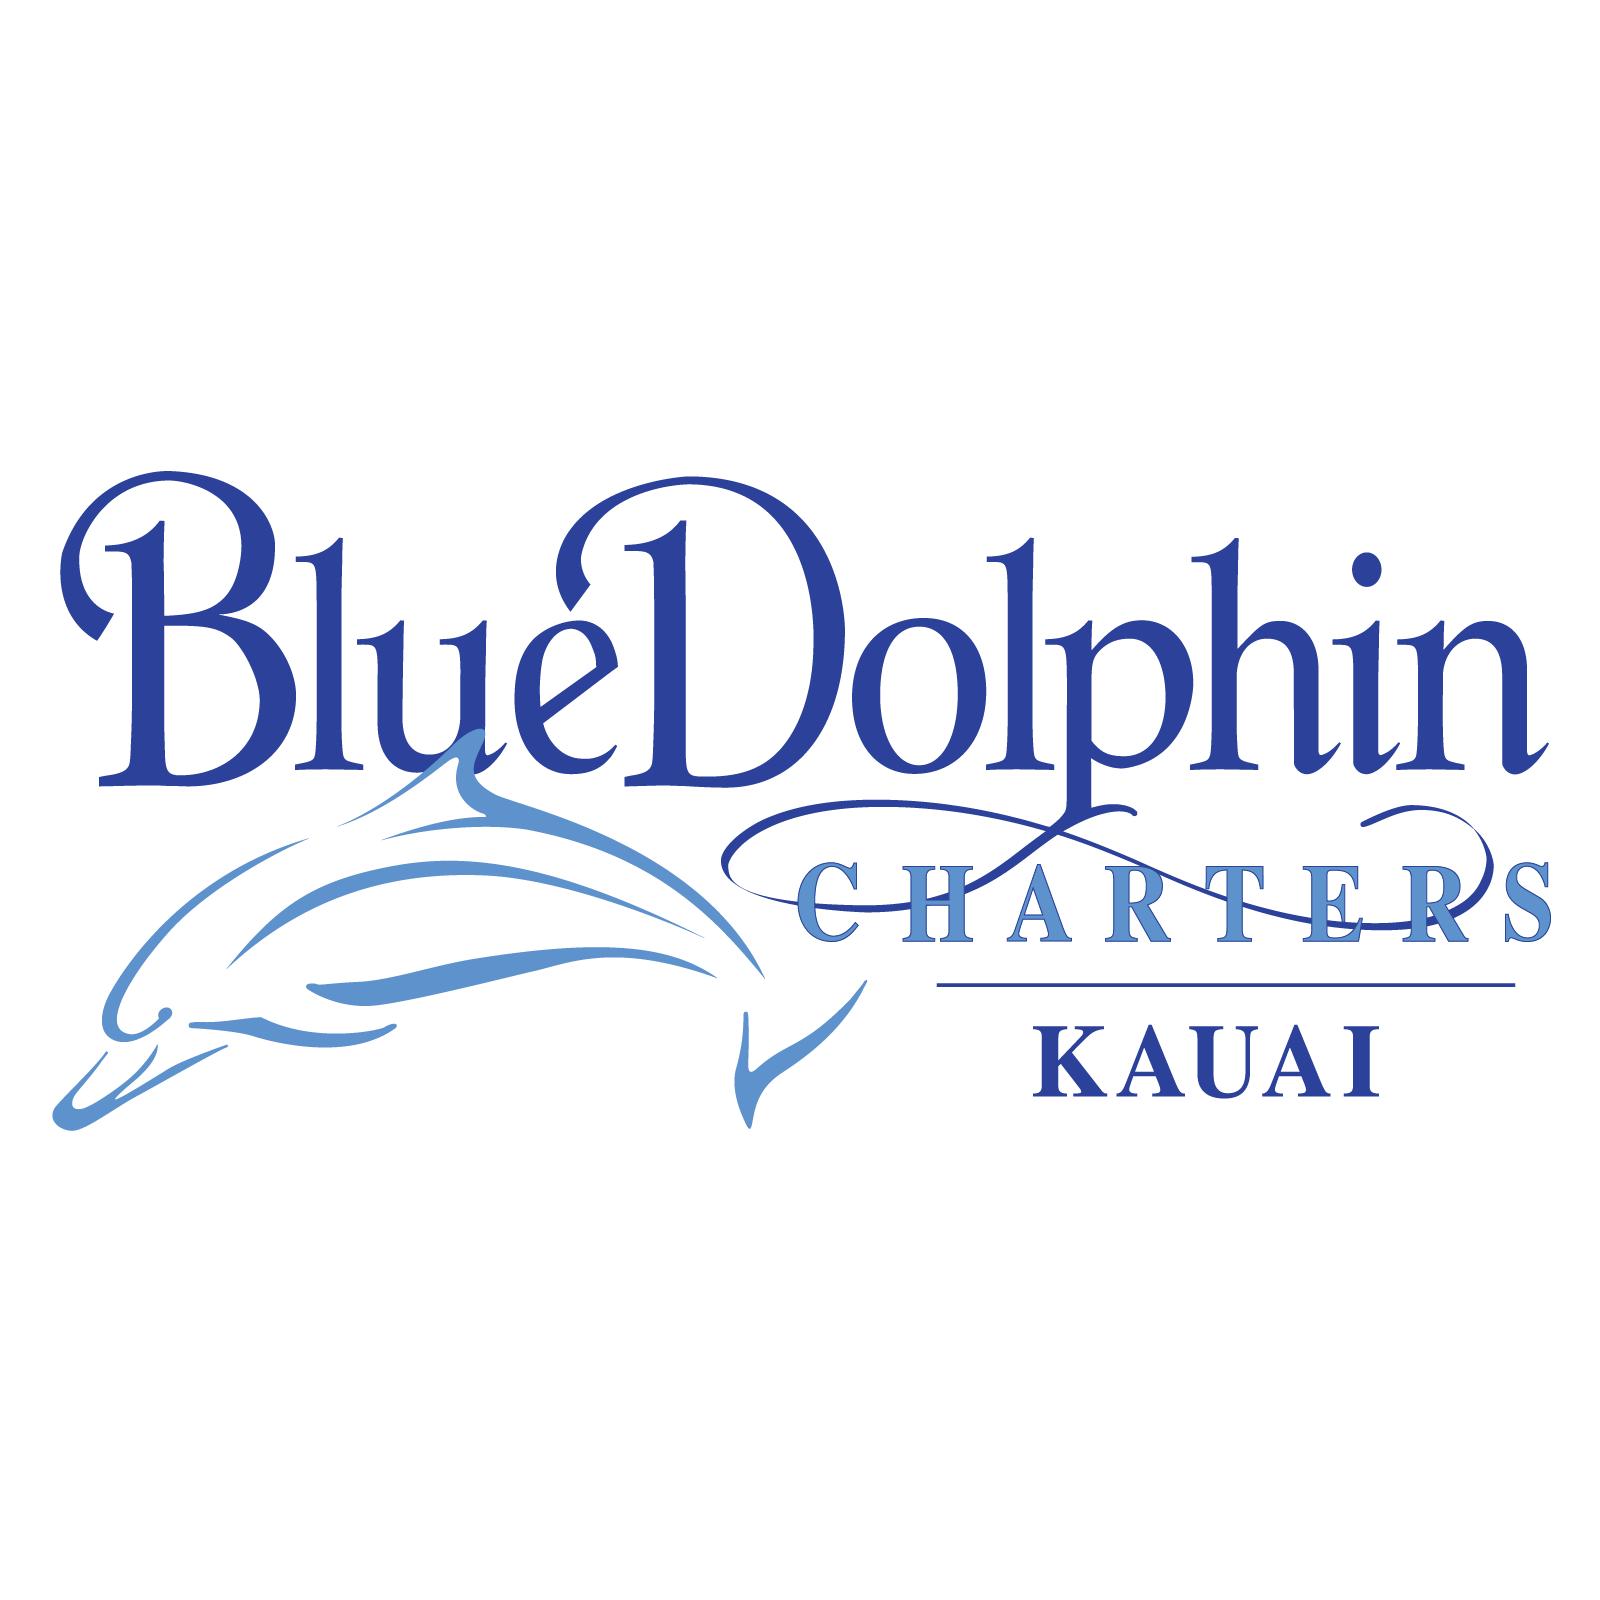 Blue Dolphin Charters - Eleele, HI - Cruises & Tours